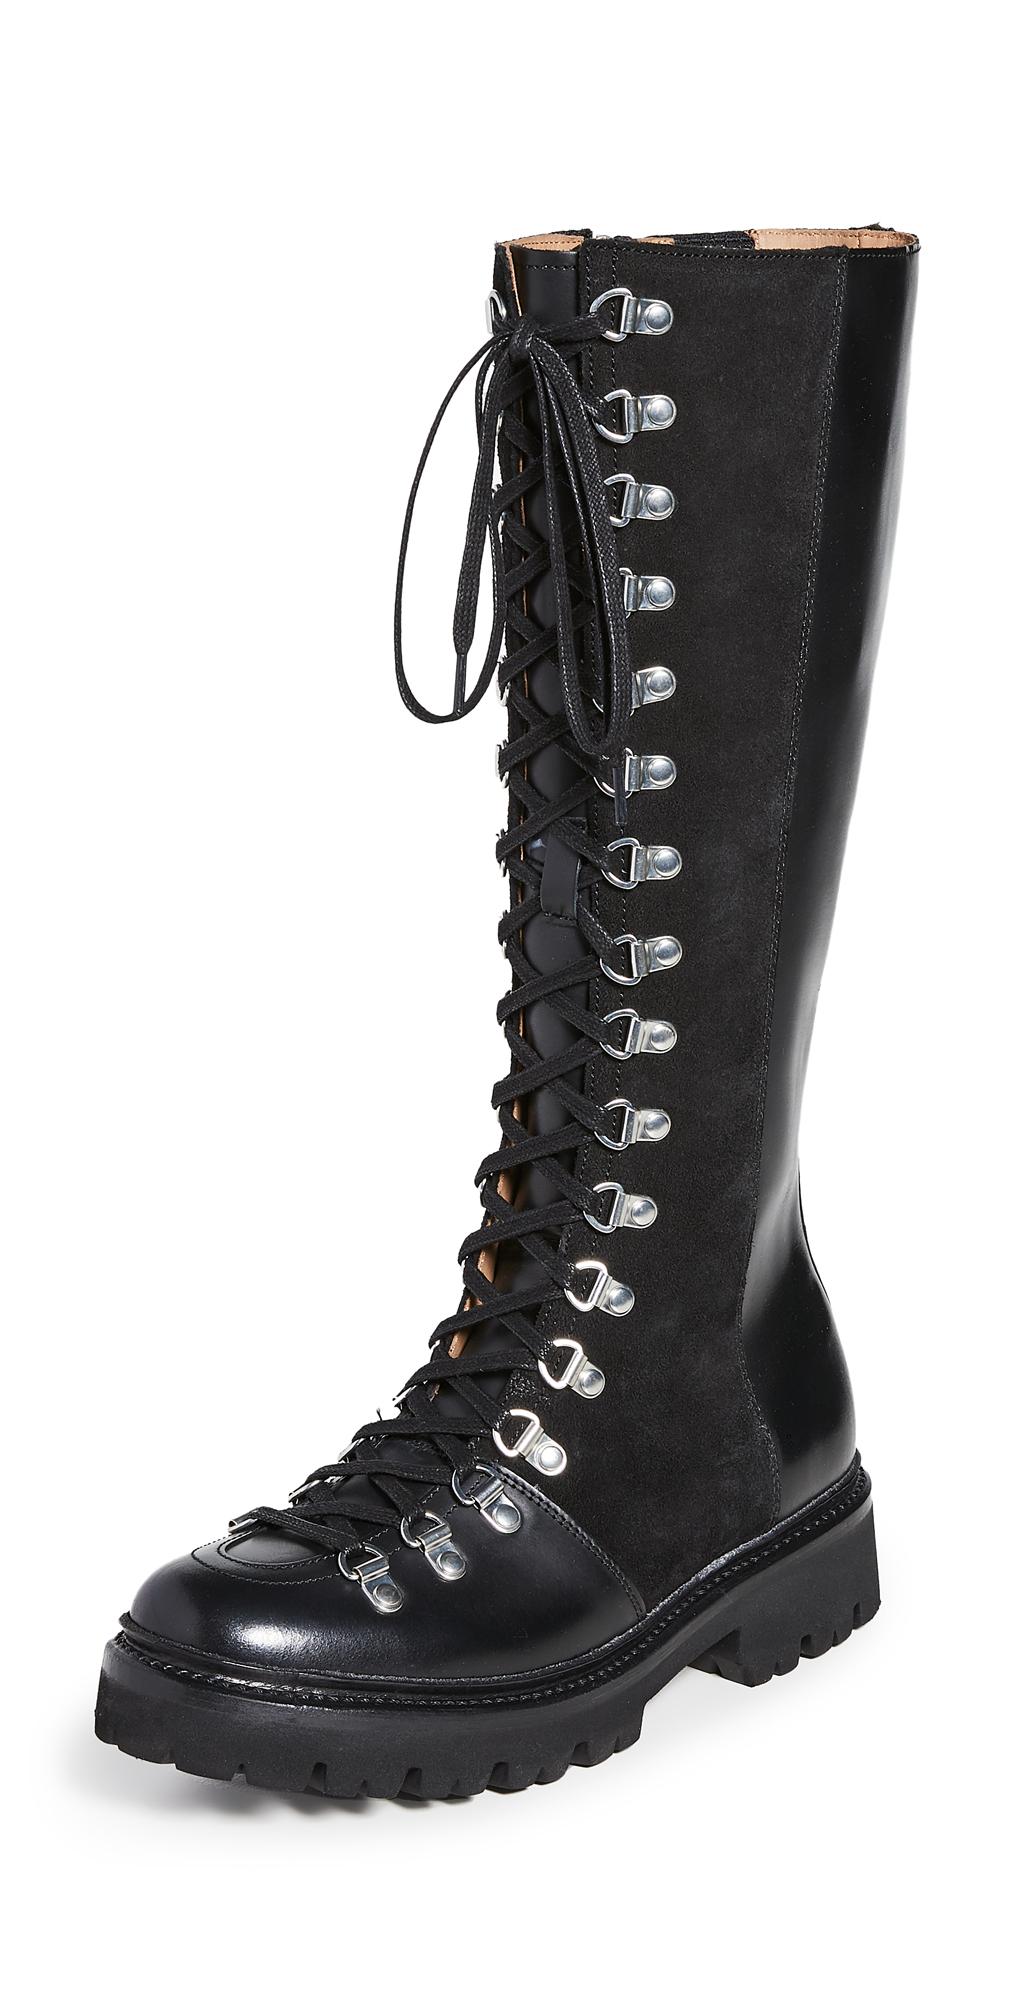 Grenson Nanette Hi Boots